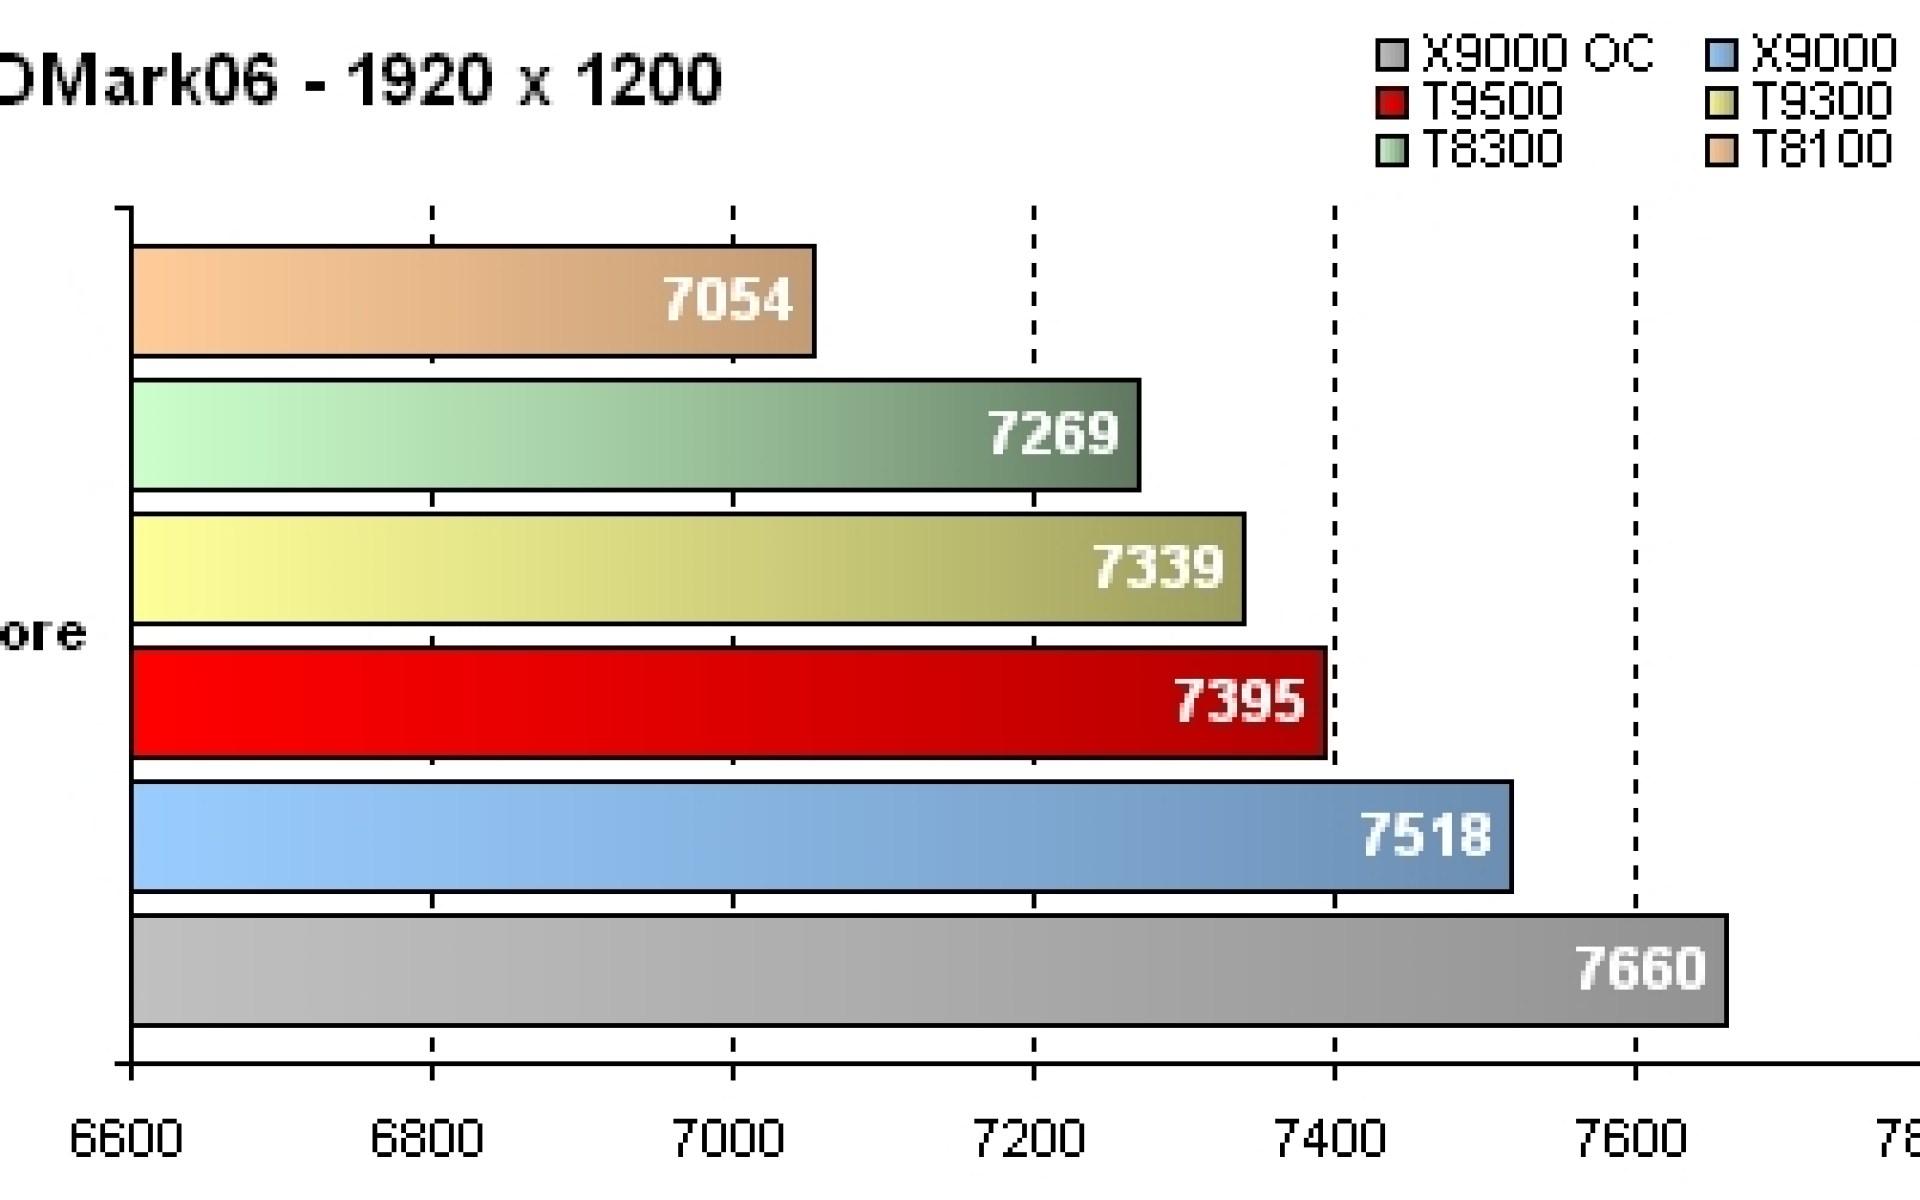 GeForce 8800M GTX - Résultats 3DMark06 Score - 1920 x 1200